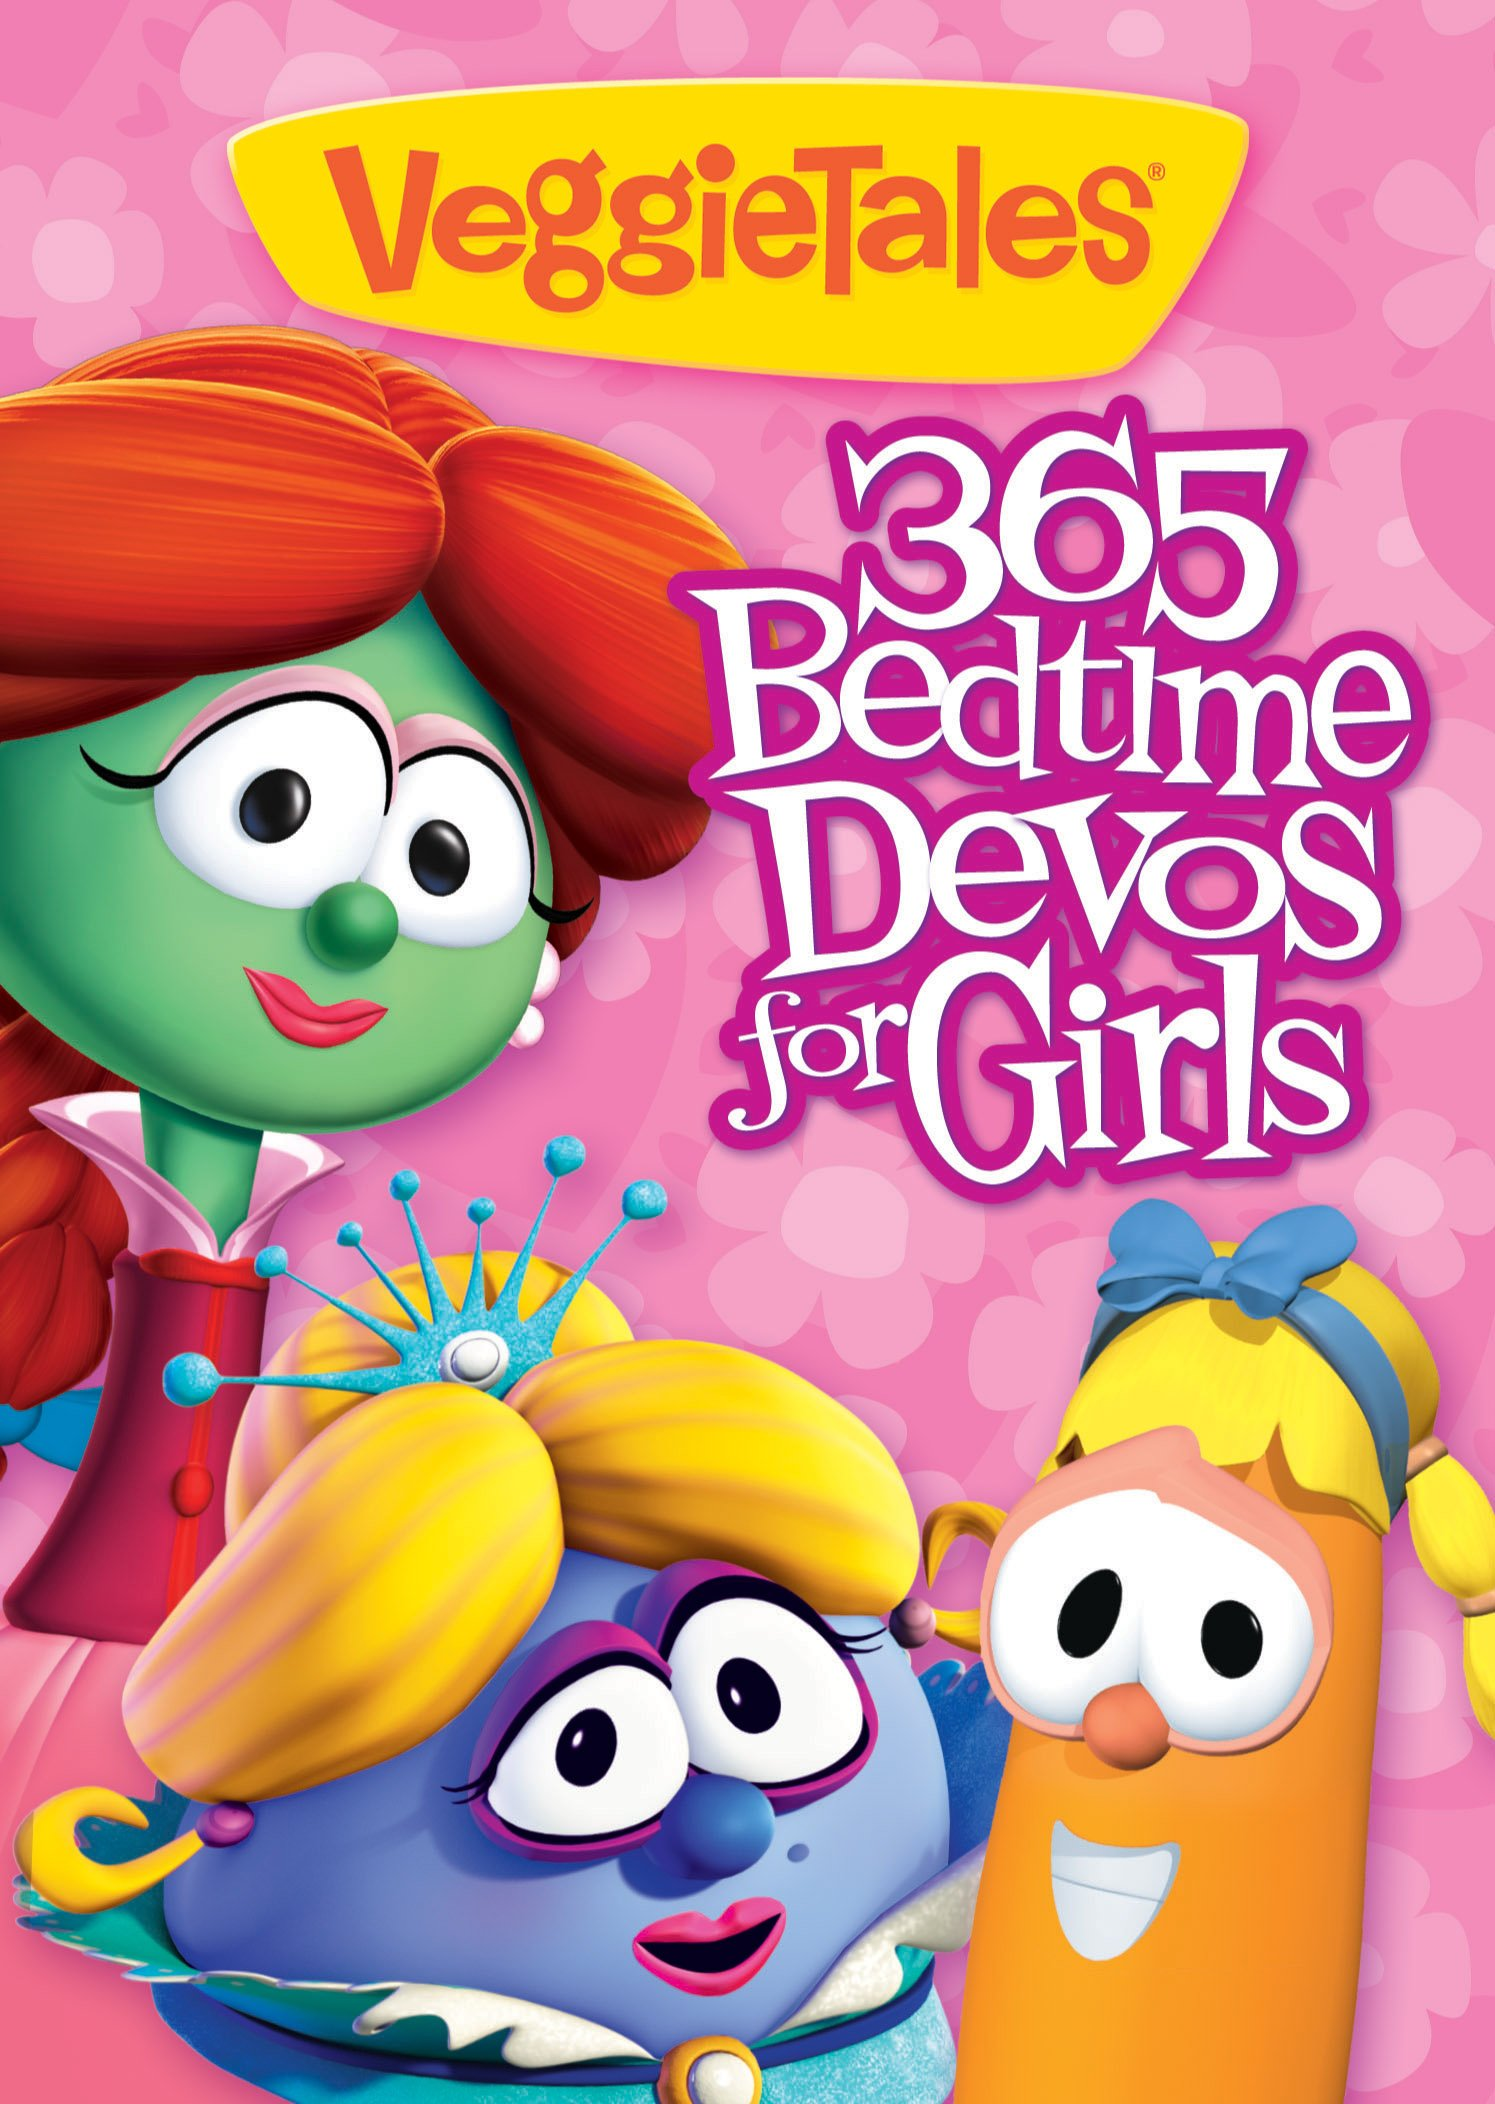 VeggieTales: 365 Bedtime Devos for Girls Paperback – January 20, 2012